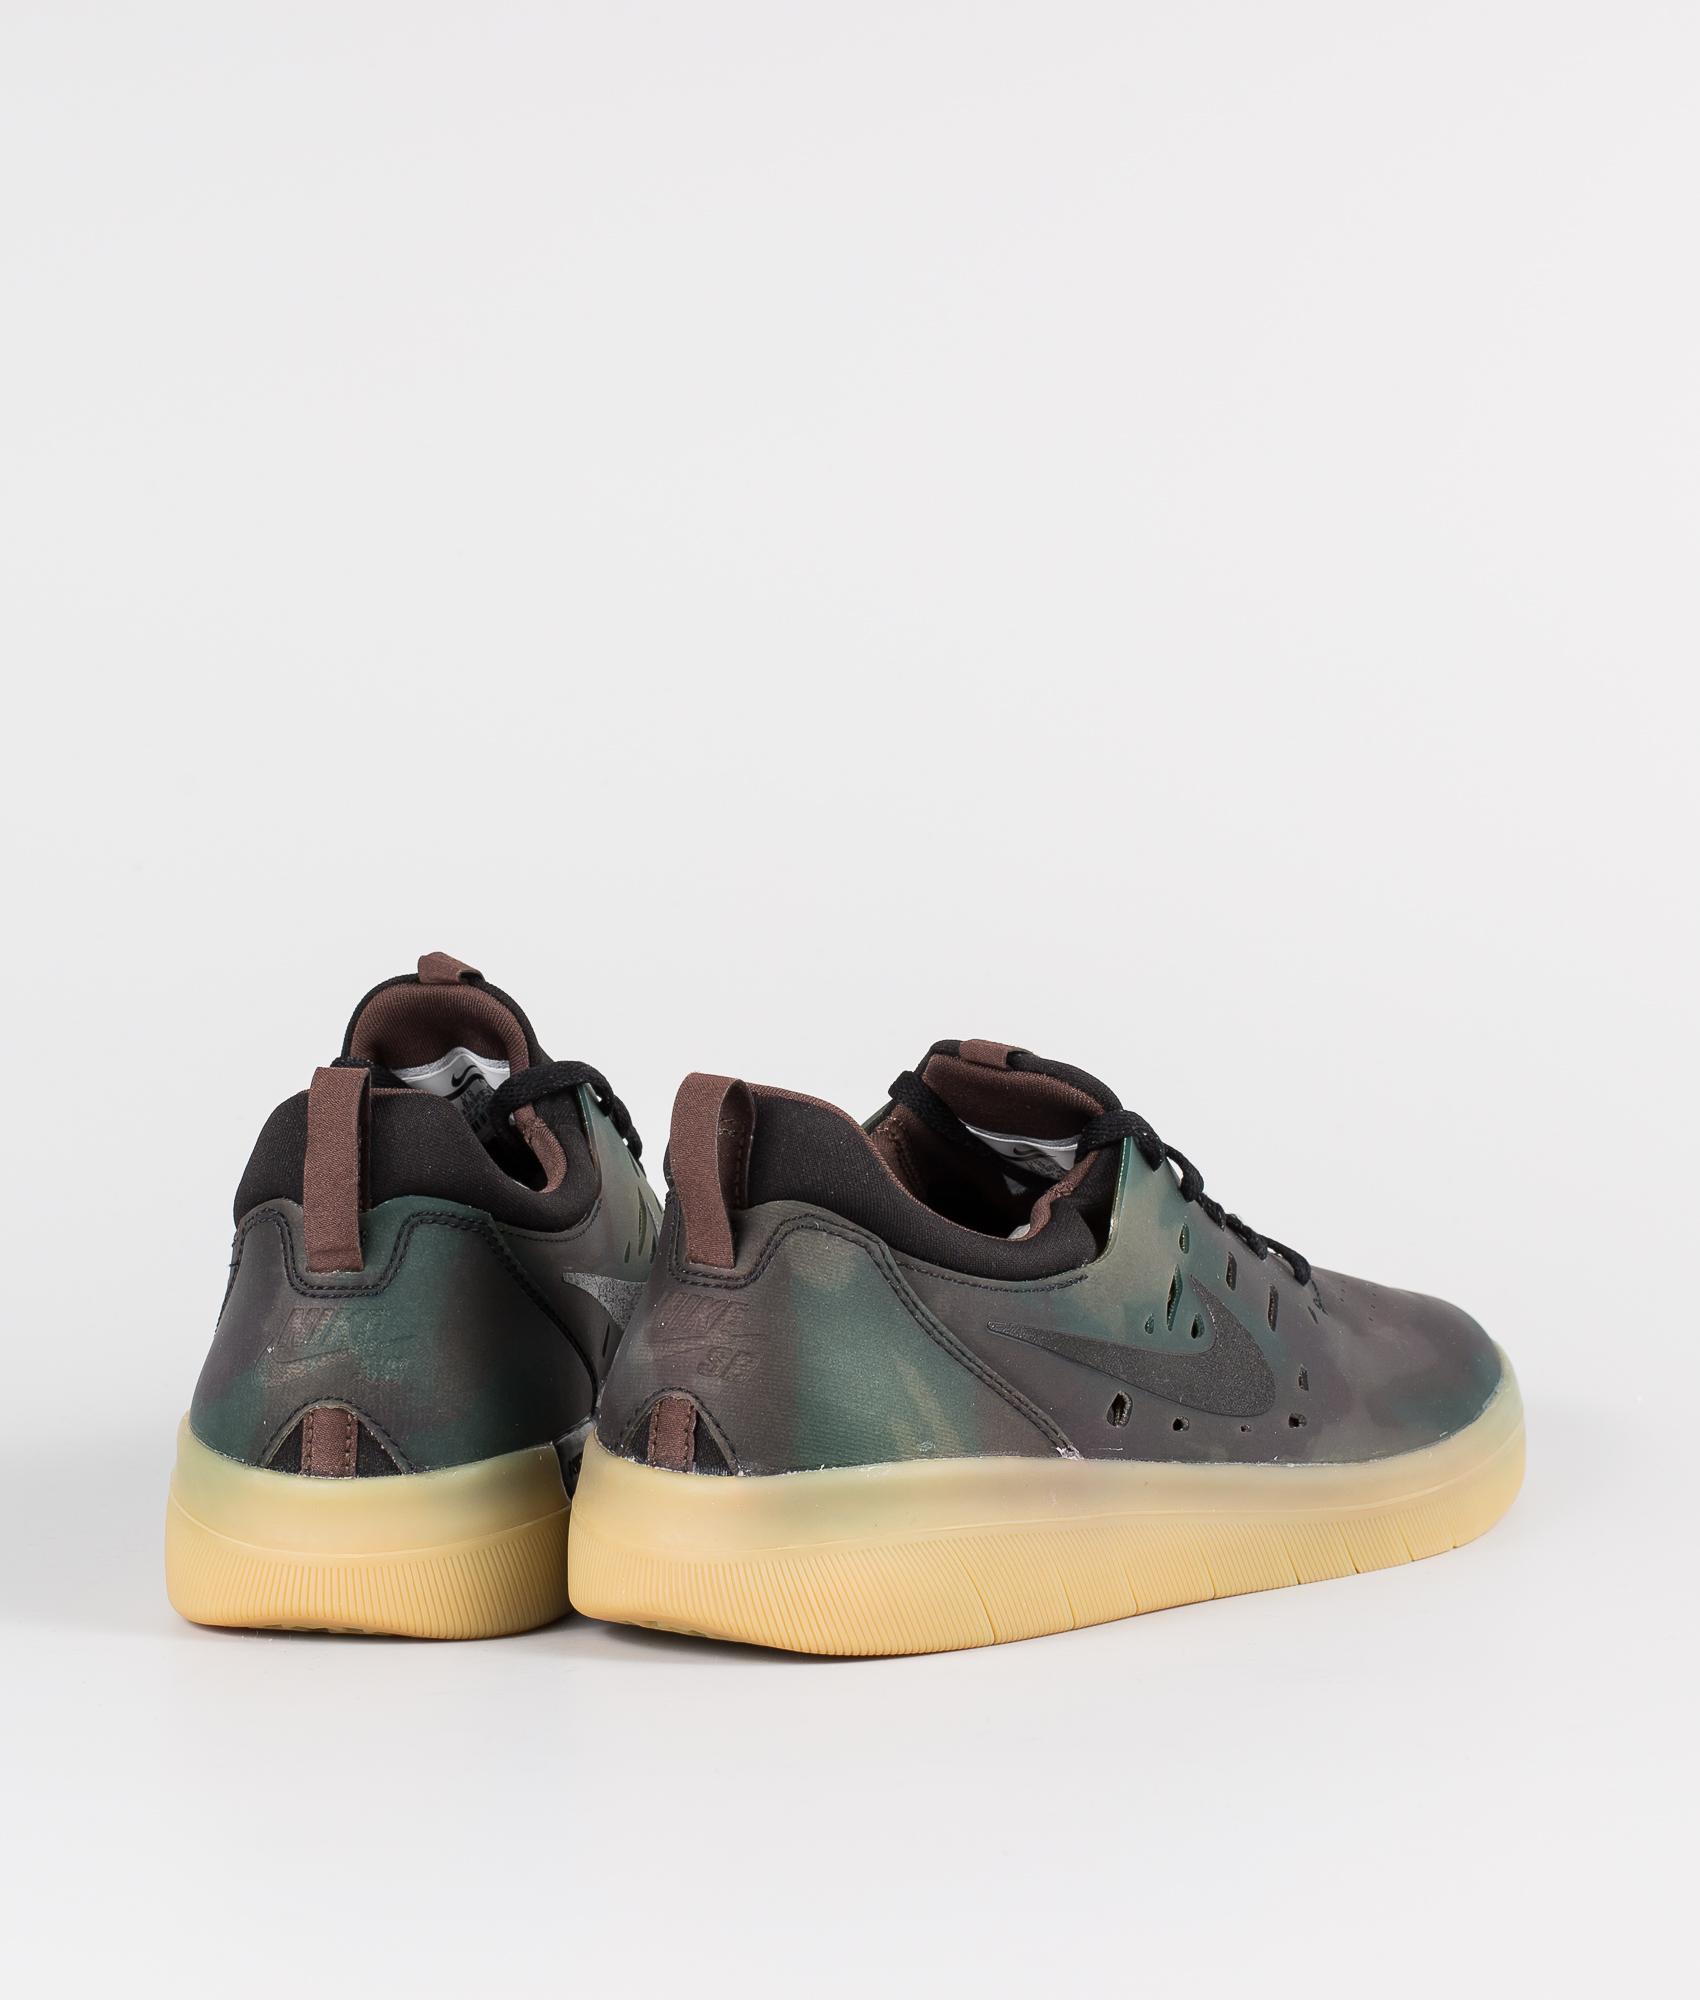 Nike SB Nyjah Free Prm Skor Multi ColorBlack Gum Light Brown